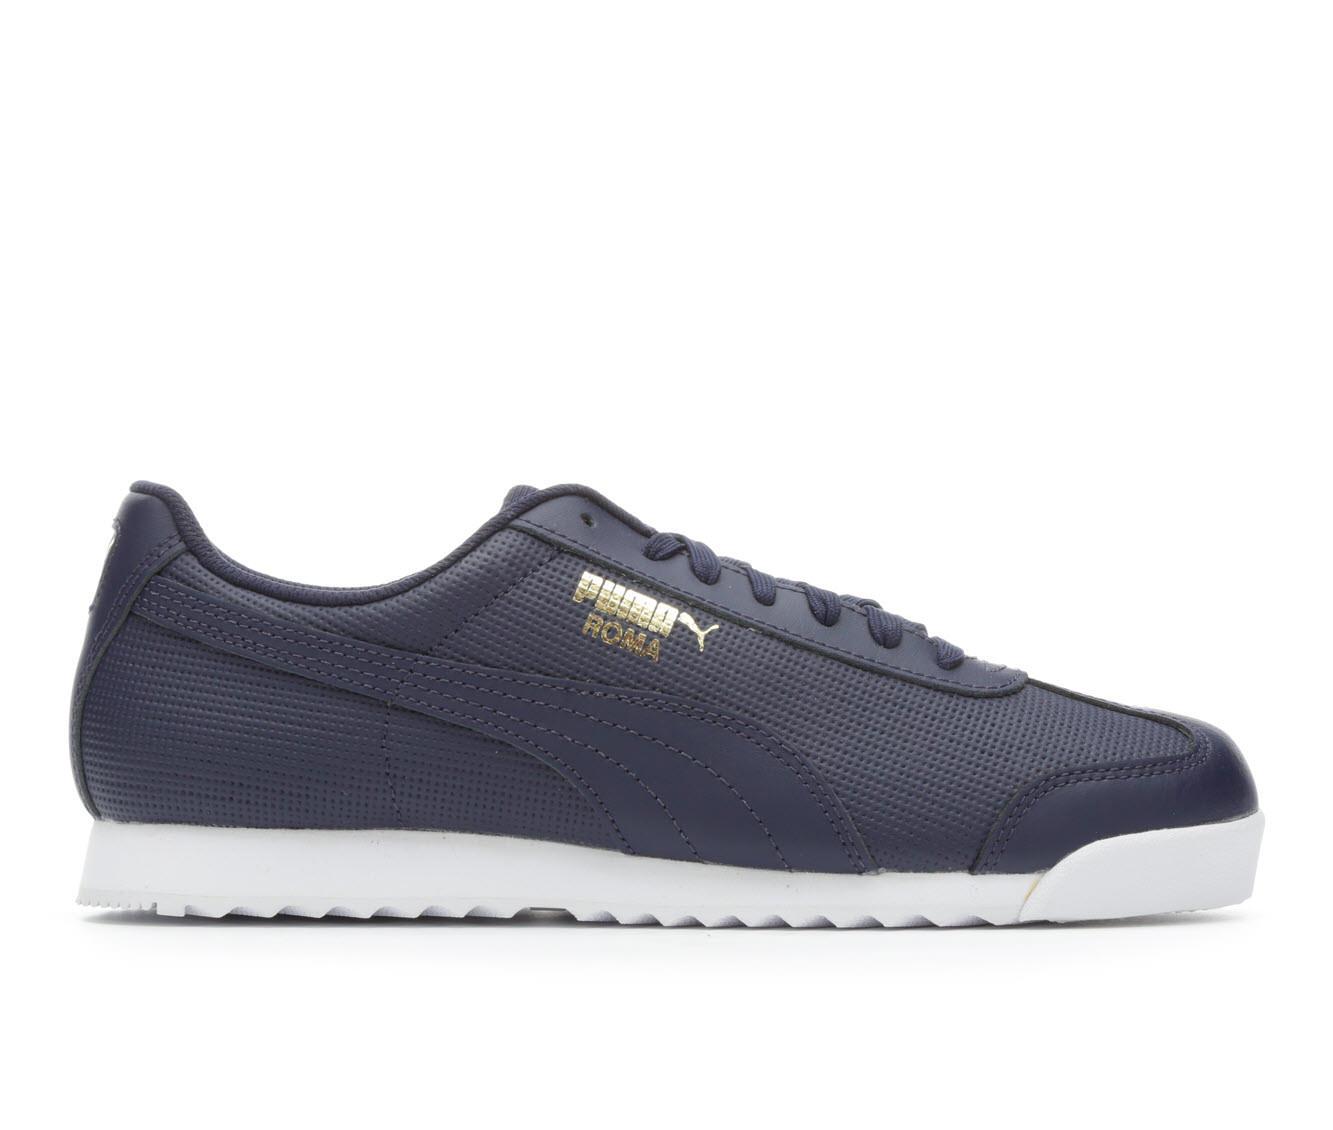 Men's Puma Roma Perf Sneakers (Blue - Size 9.5) 1660308